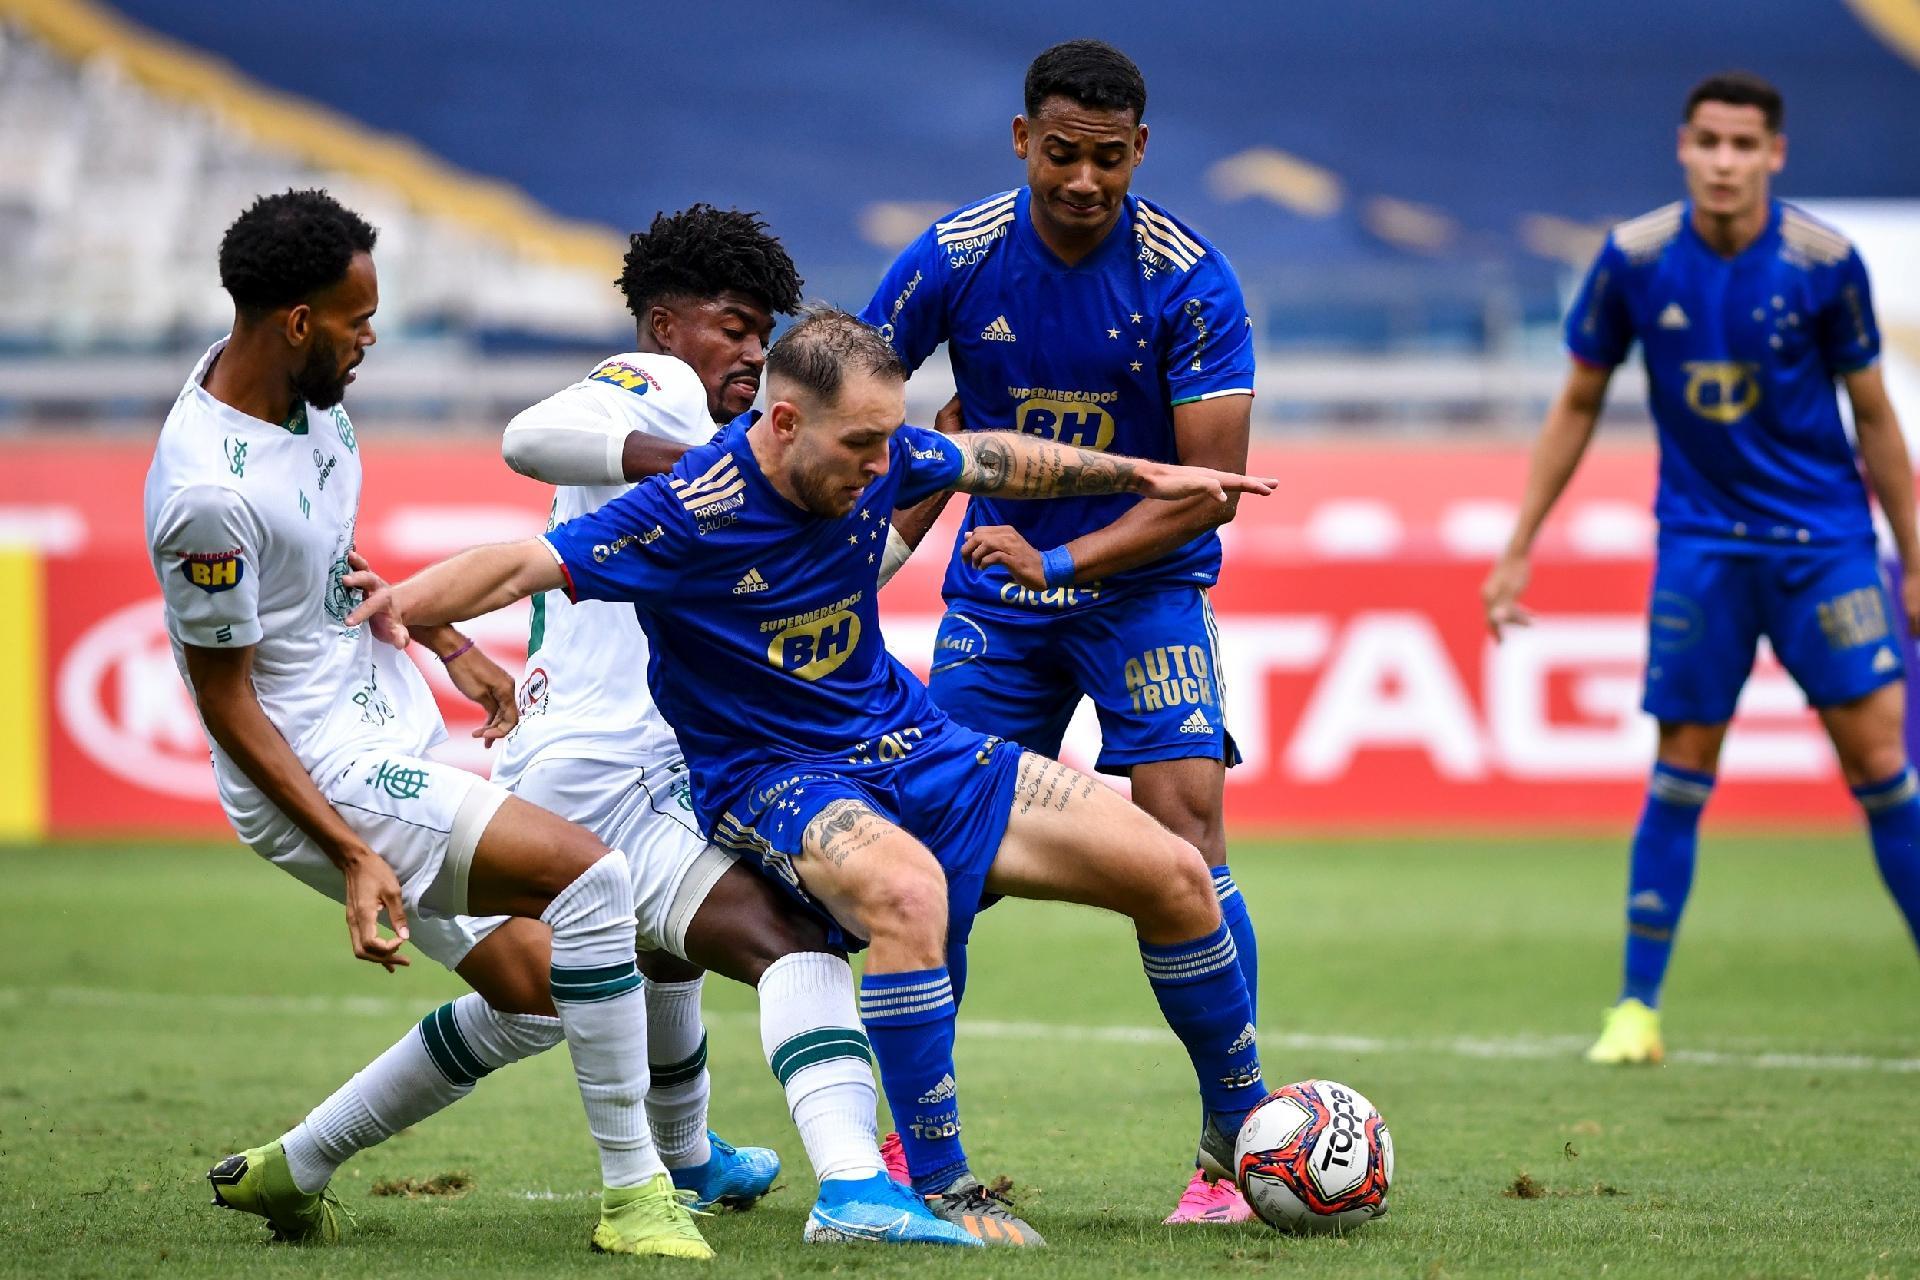 Cruzeiro Leva Virada Do America Mg Na Semifinal Do Campeonato Mineiro